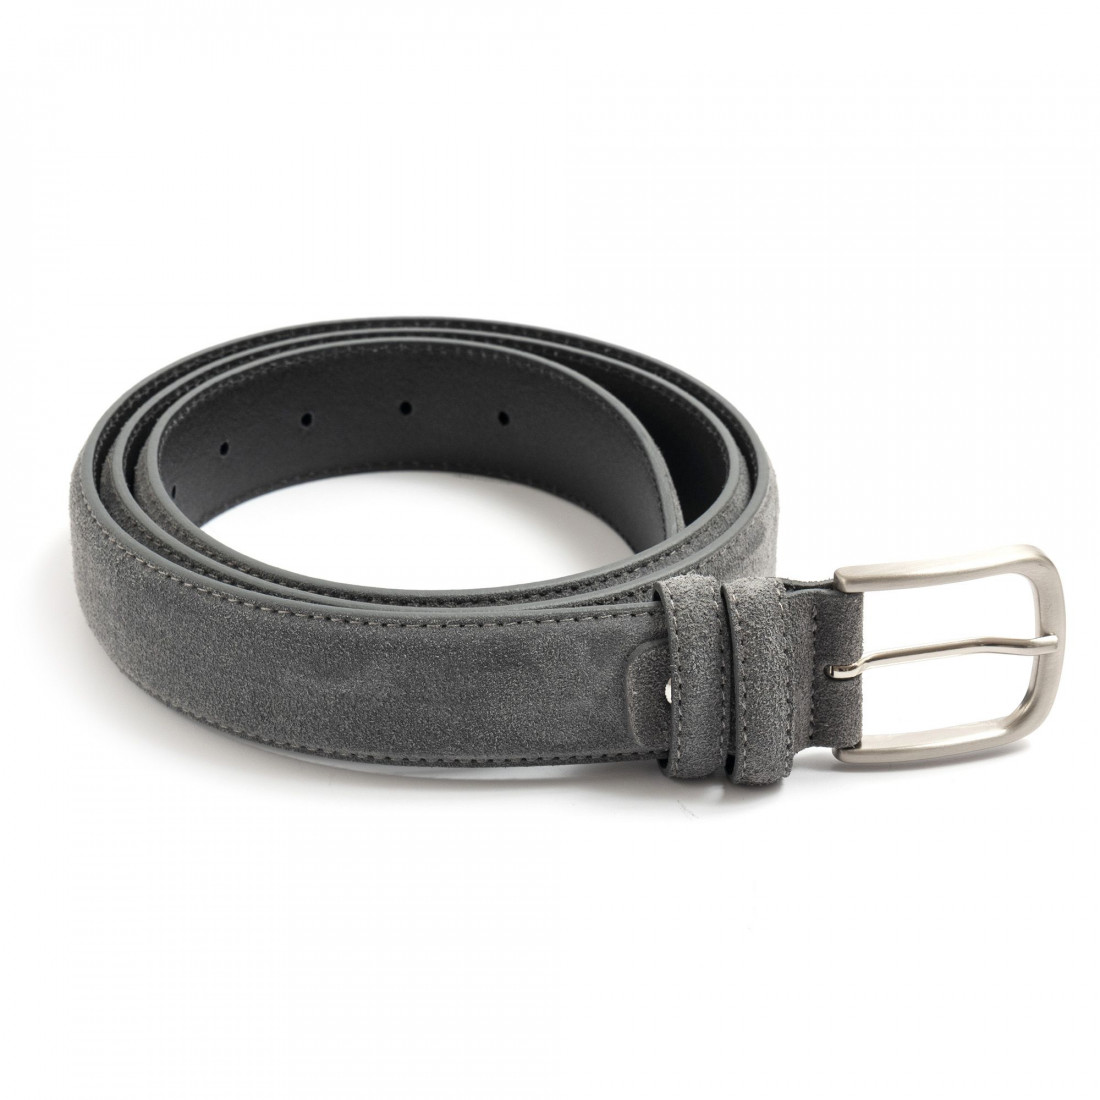 belts man sangiorgio 9009camoscio grigio 7423